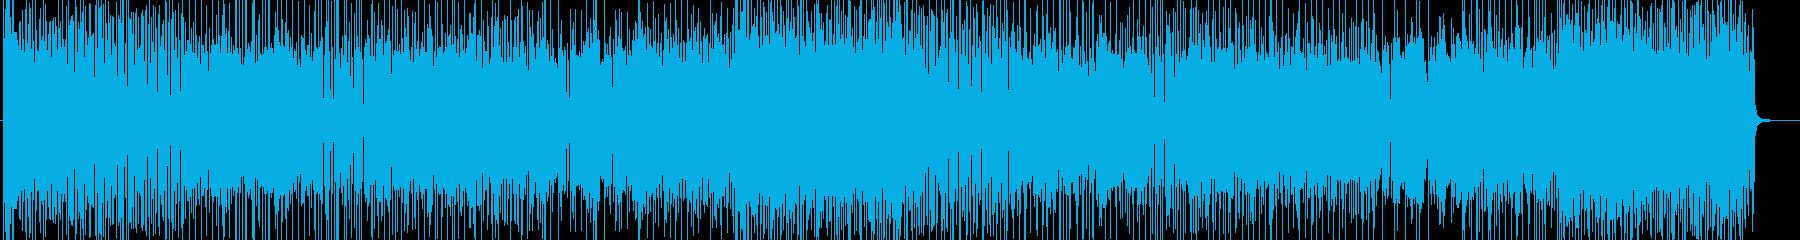 「HR/HM」「DARK」BGM128の再生済みの波形